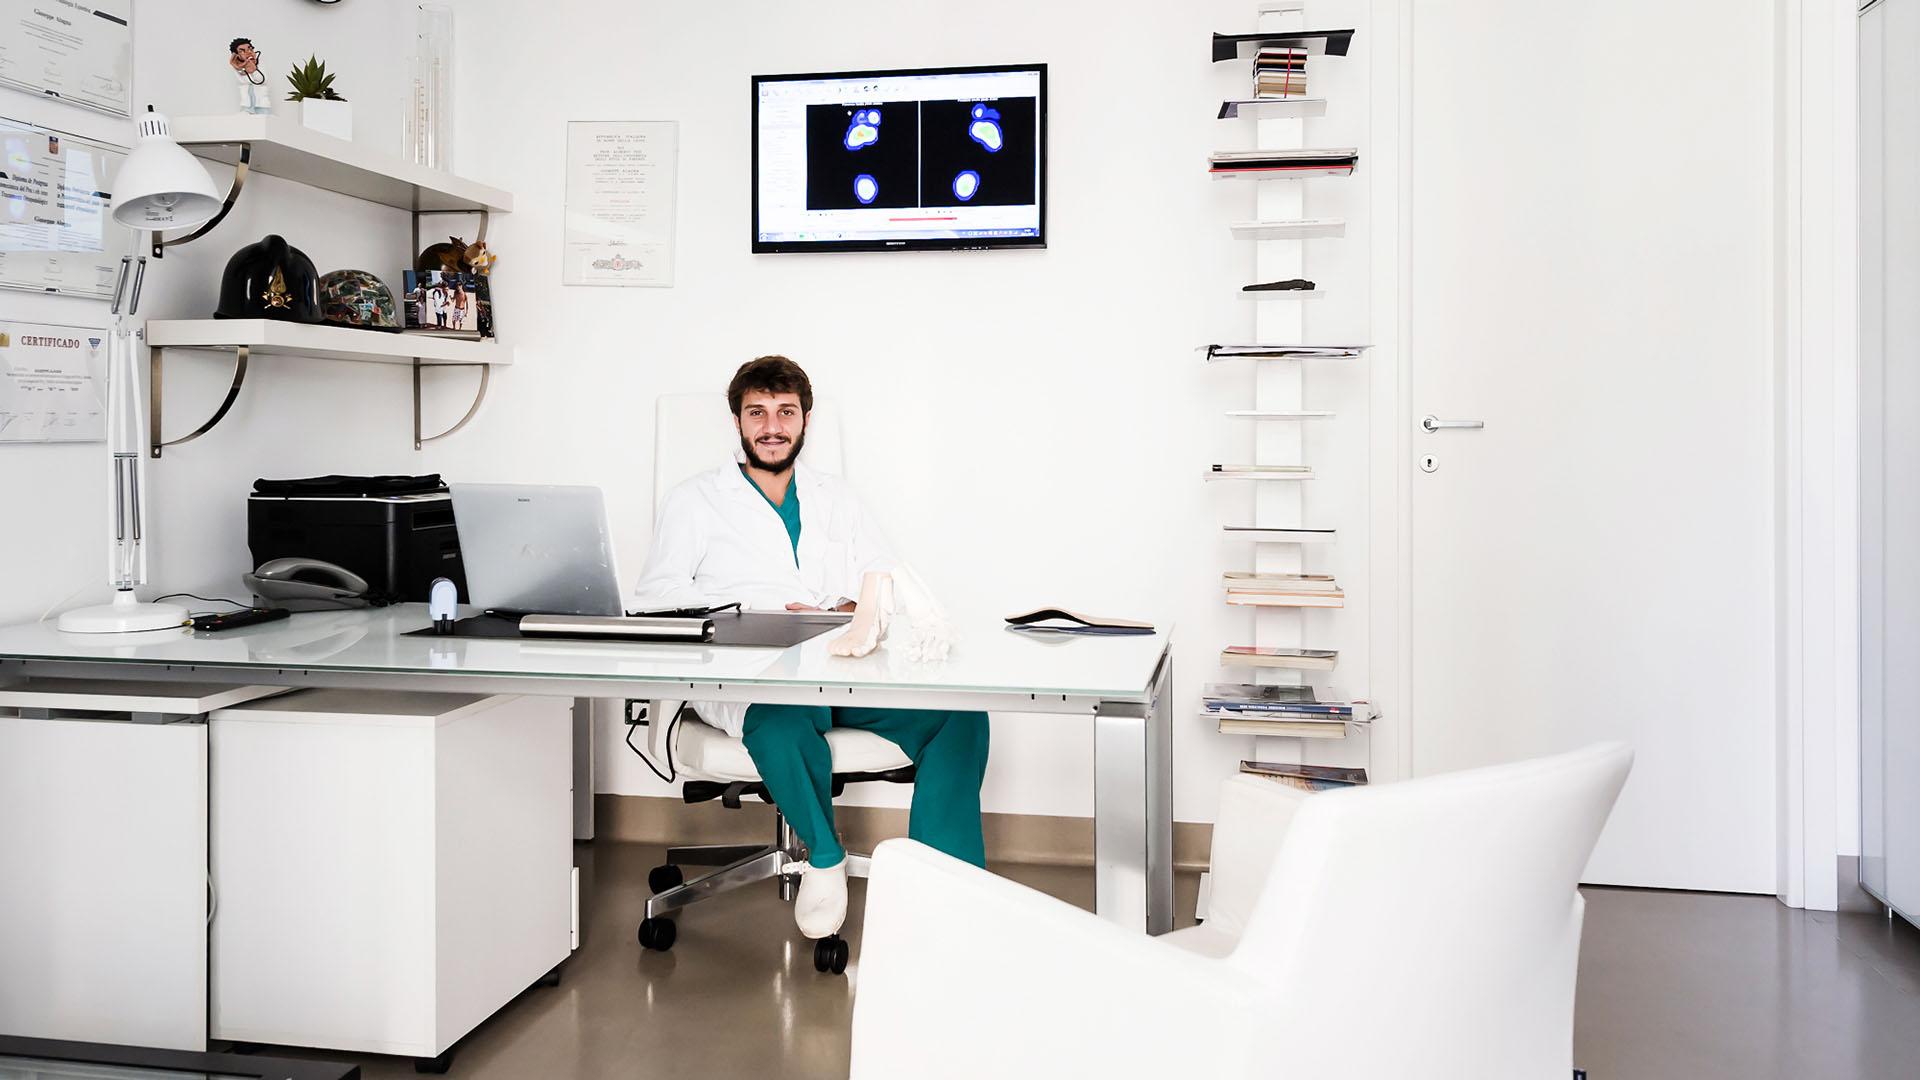 Dott. Giuseppe Alagna image